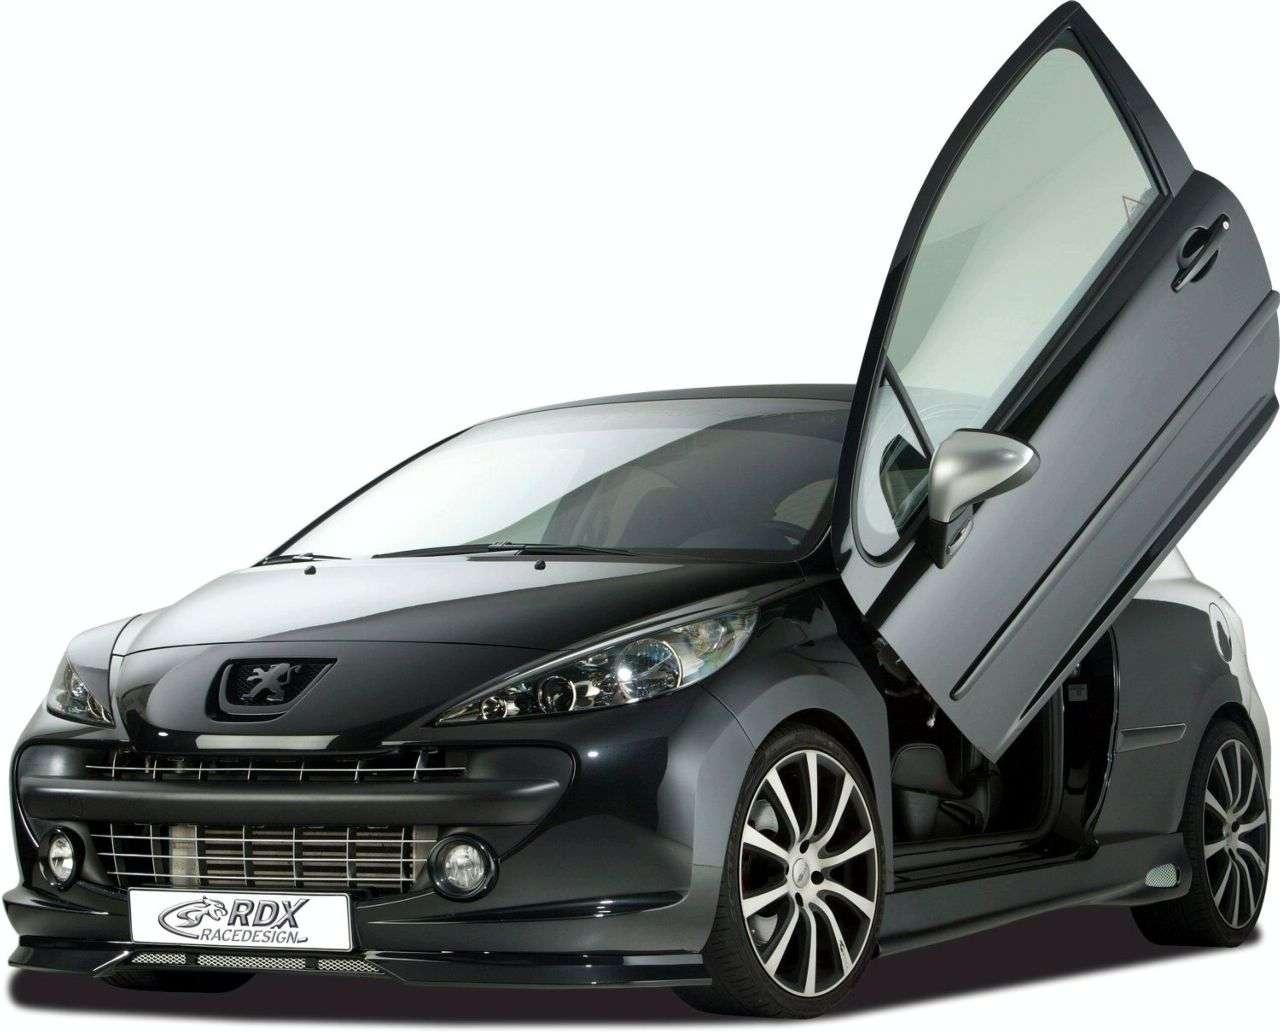 Peugeot 207 CC od firmy RDX RACEDESIGN 2010